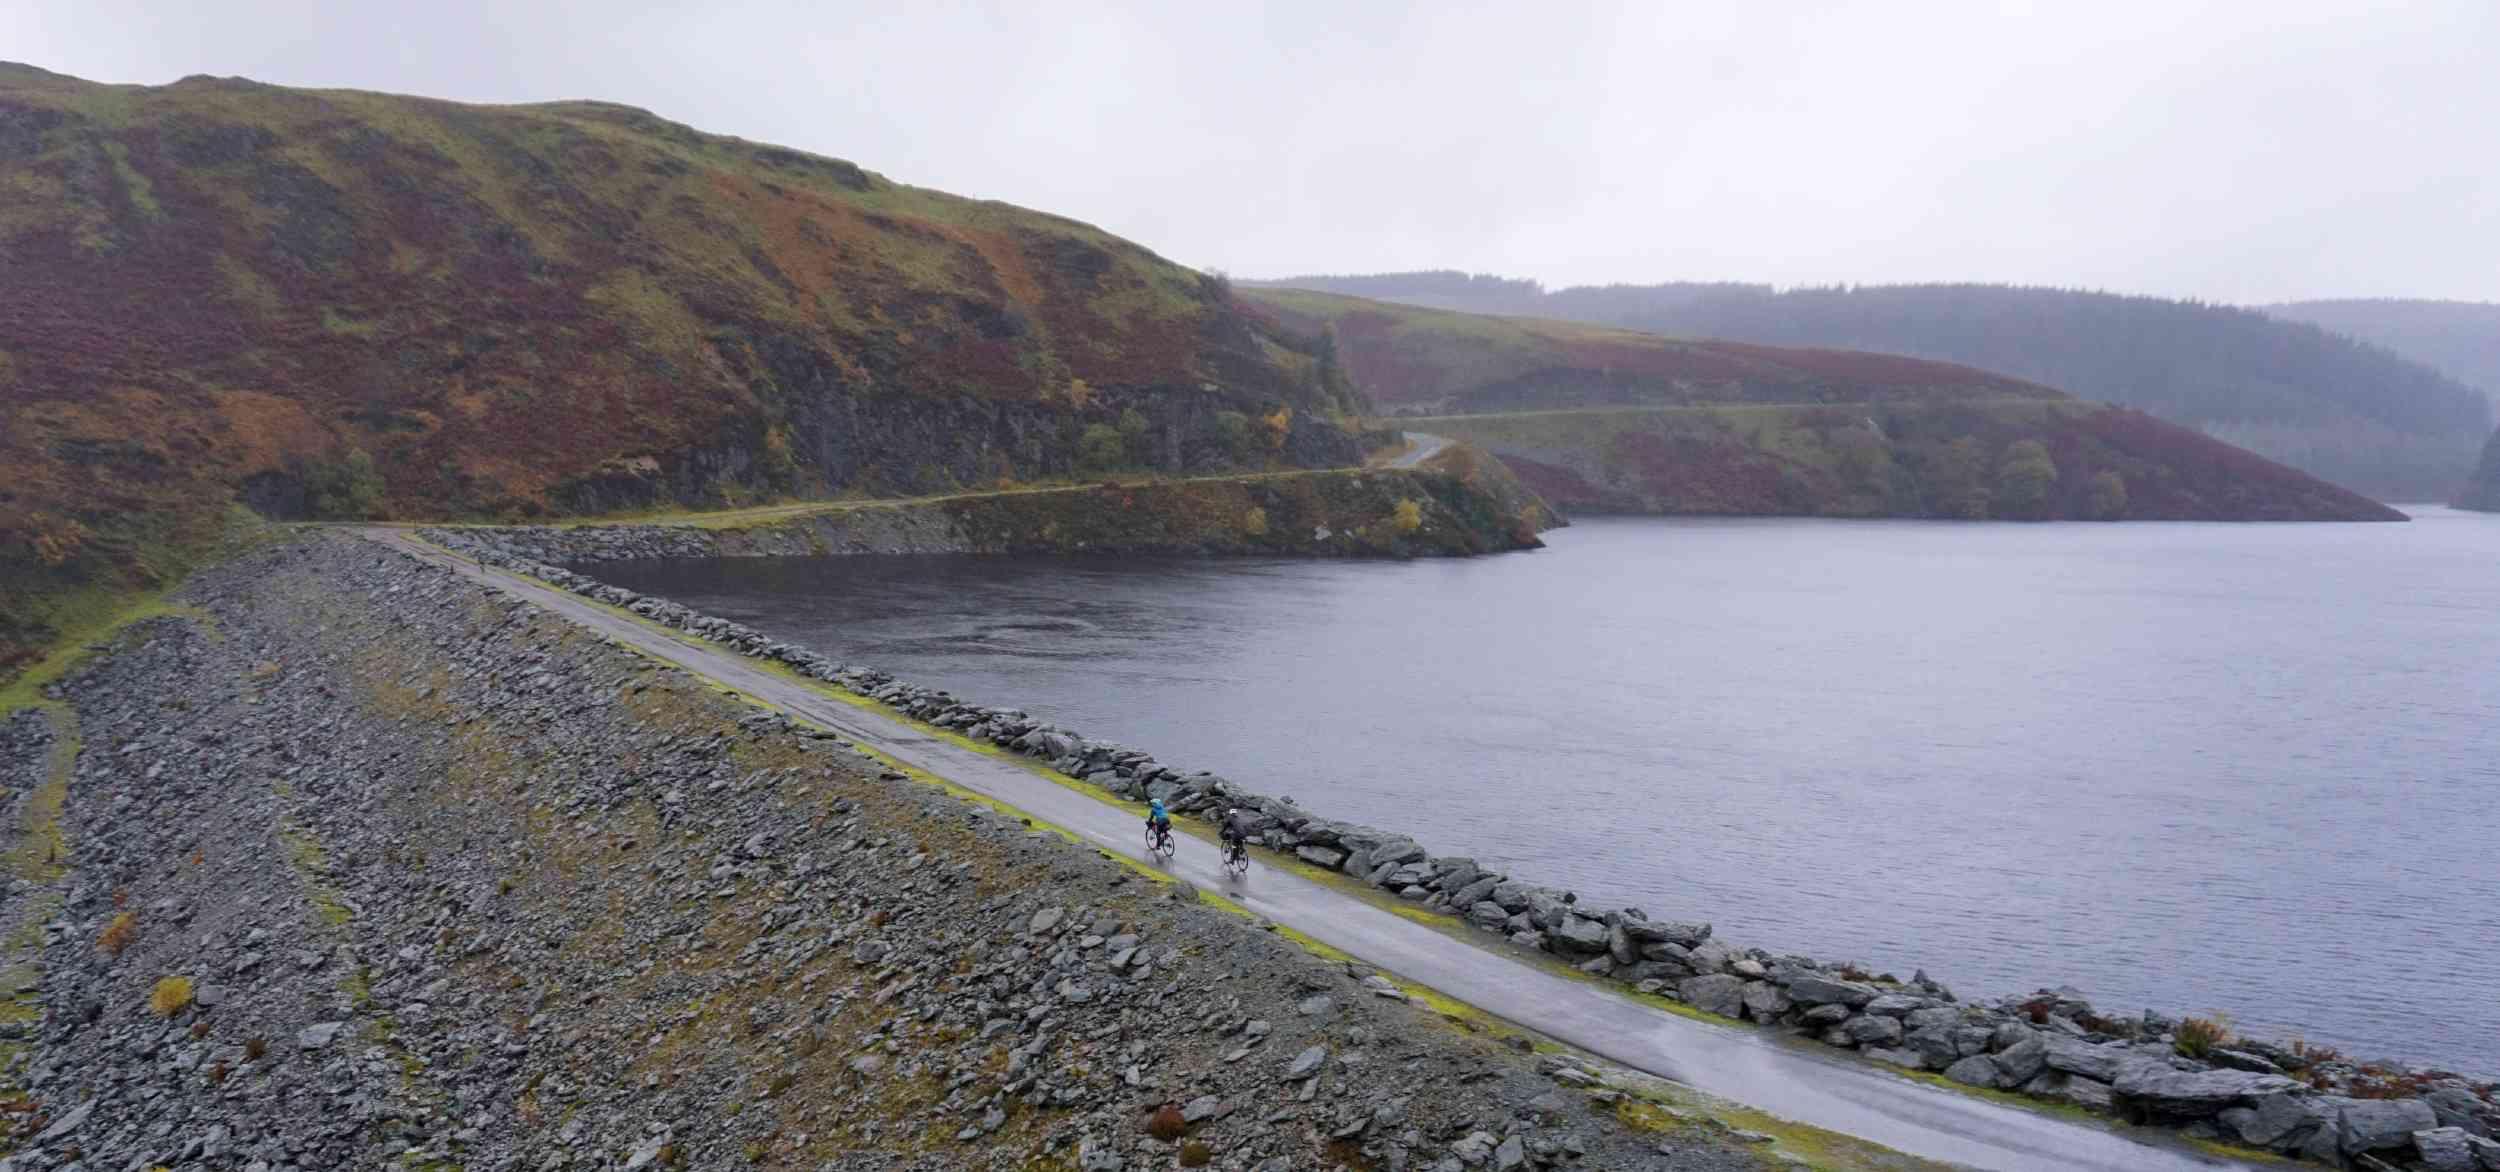 Dam road riding